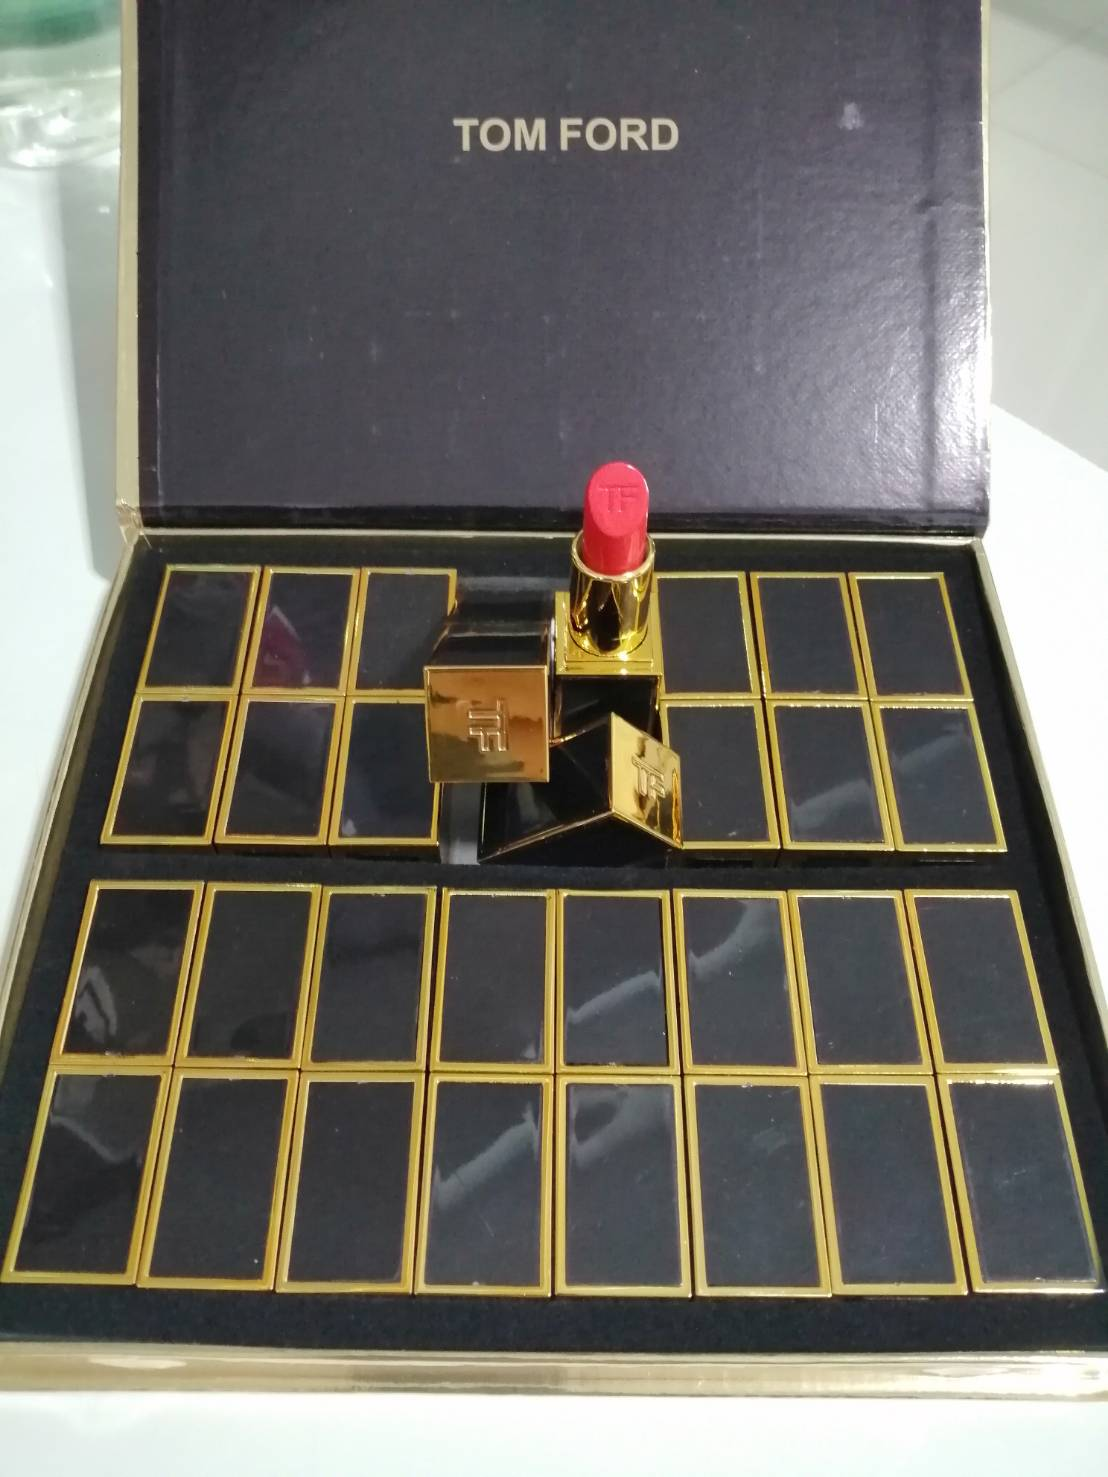 TOM FORD BEAUTY Lip Color  16psc.ลิปปอกคลาสสิคคละสีในแพคกล่องของขวัญรับปีใหม่